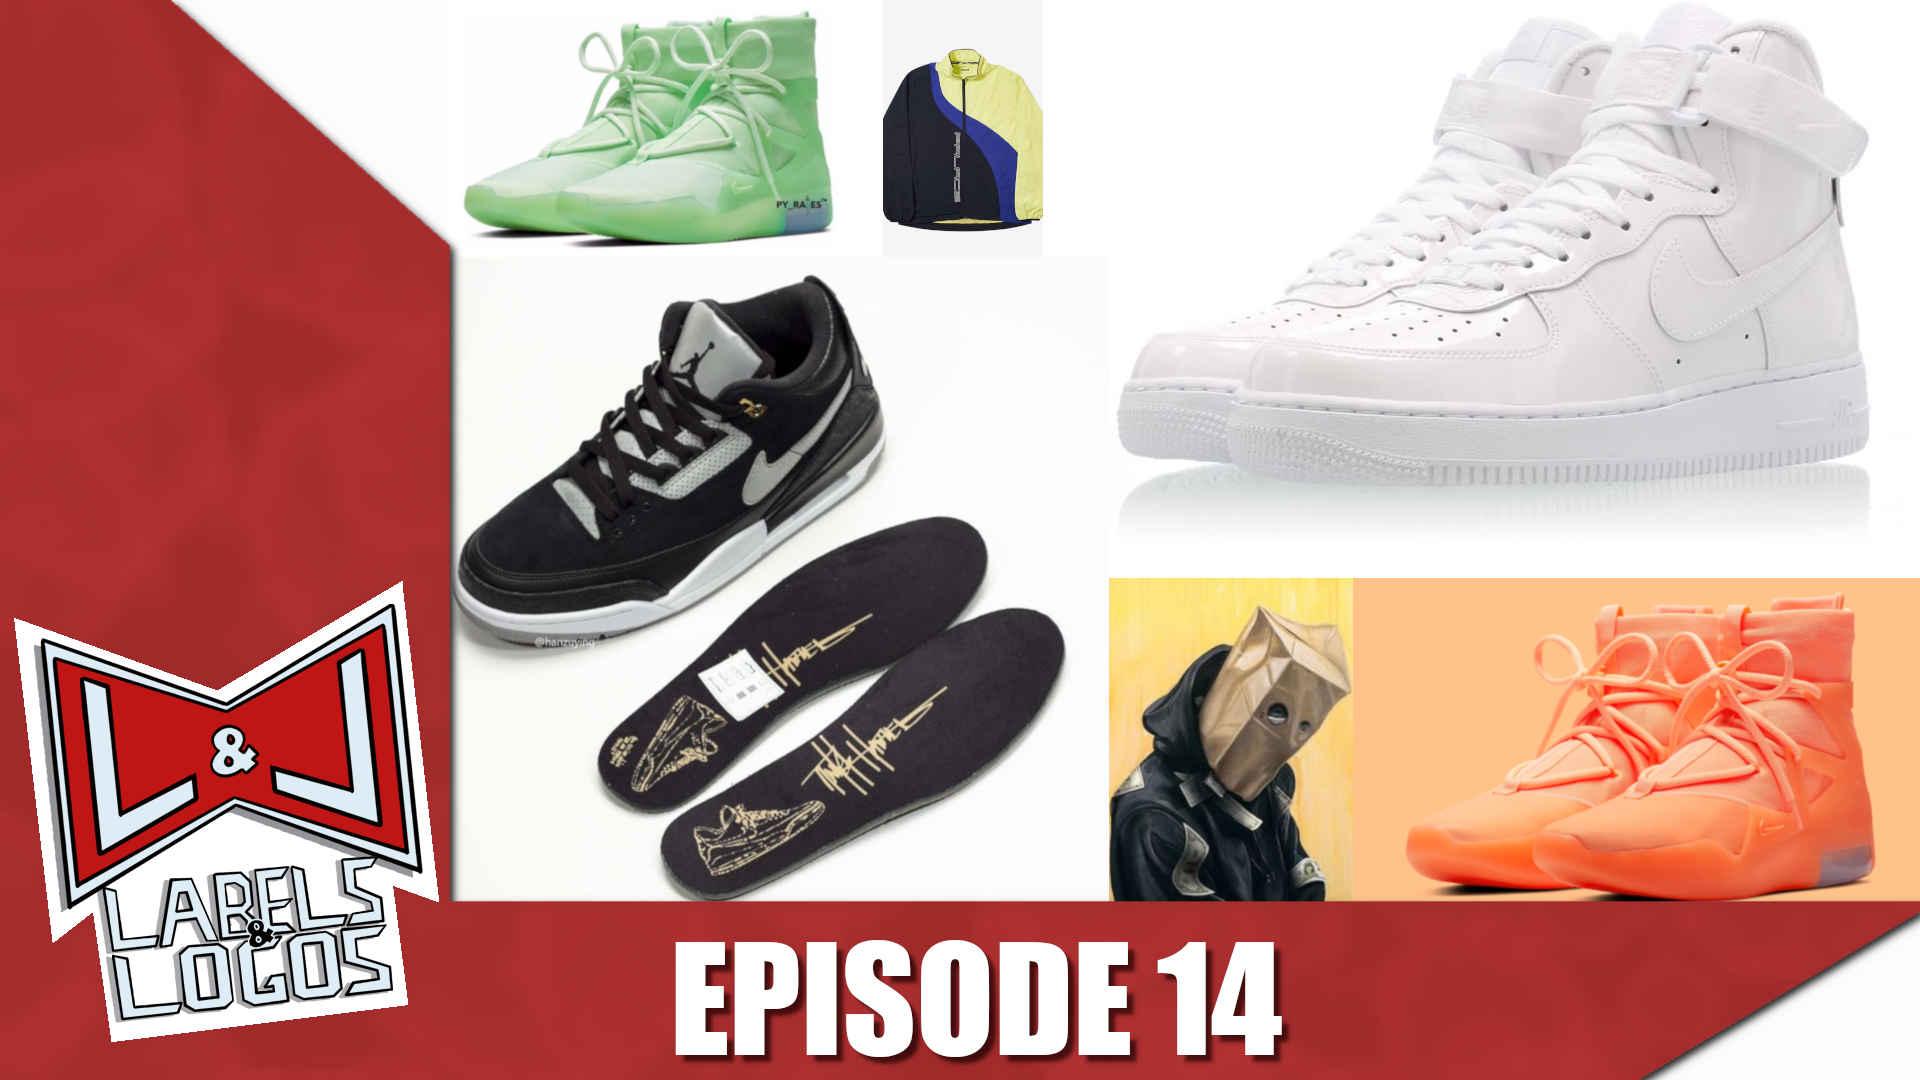 Labels & Logos - Episode 14